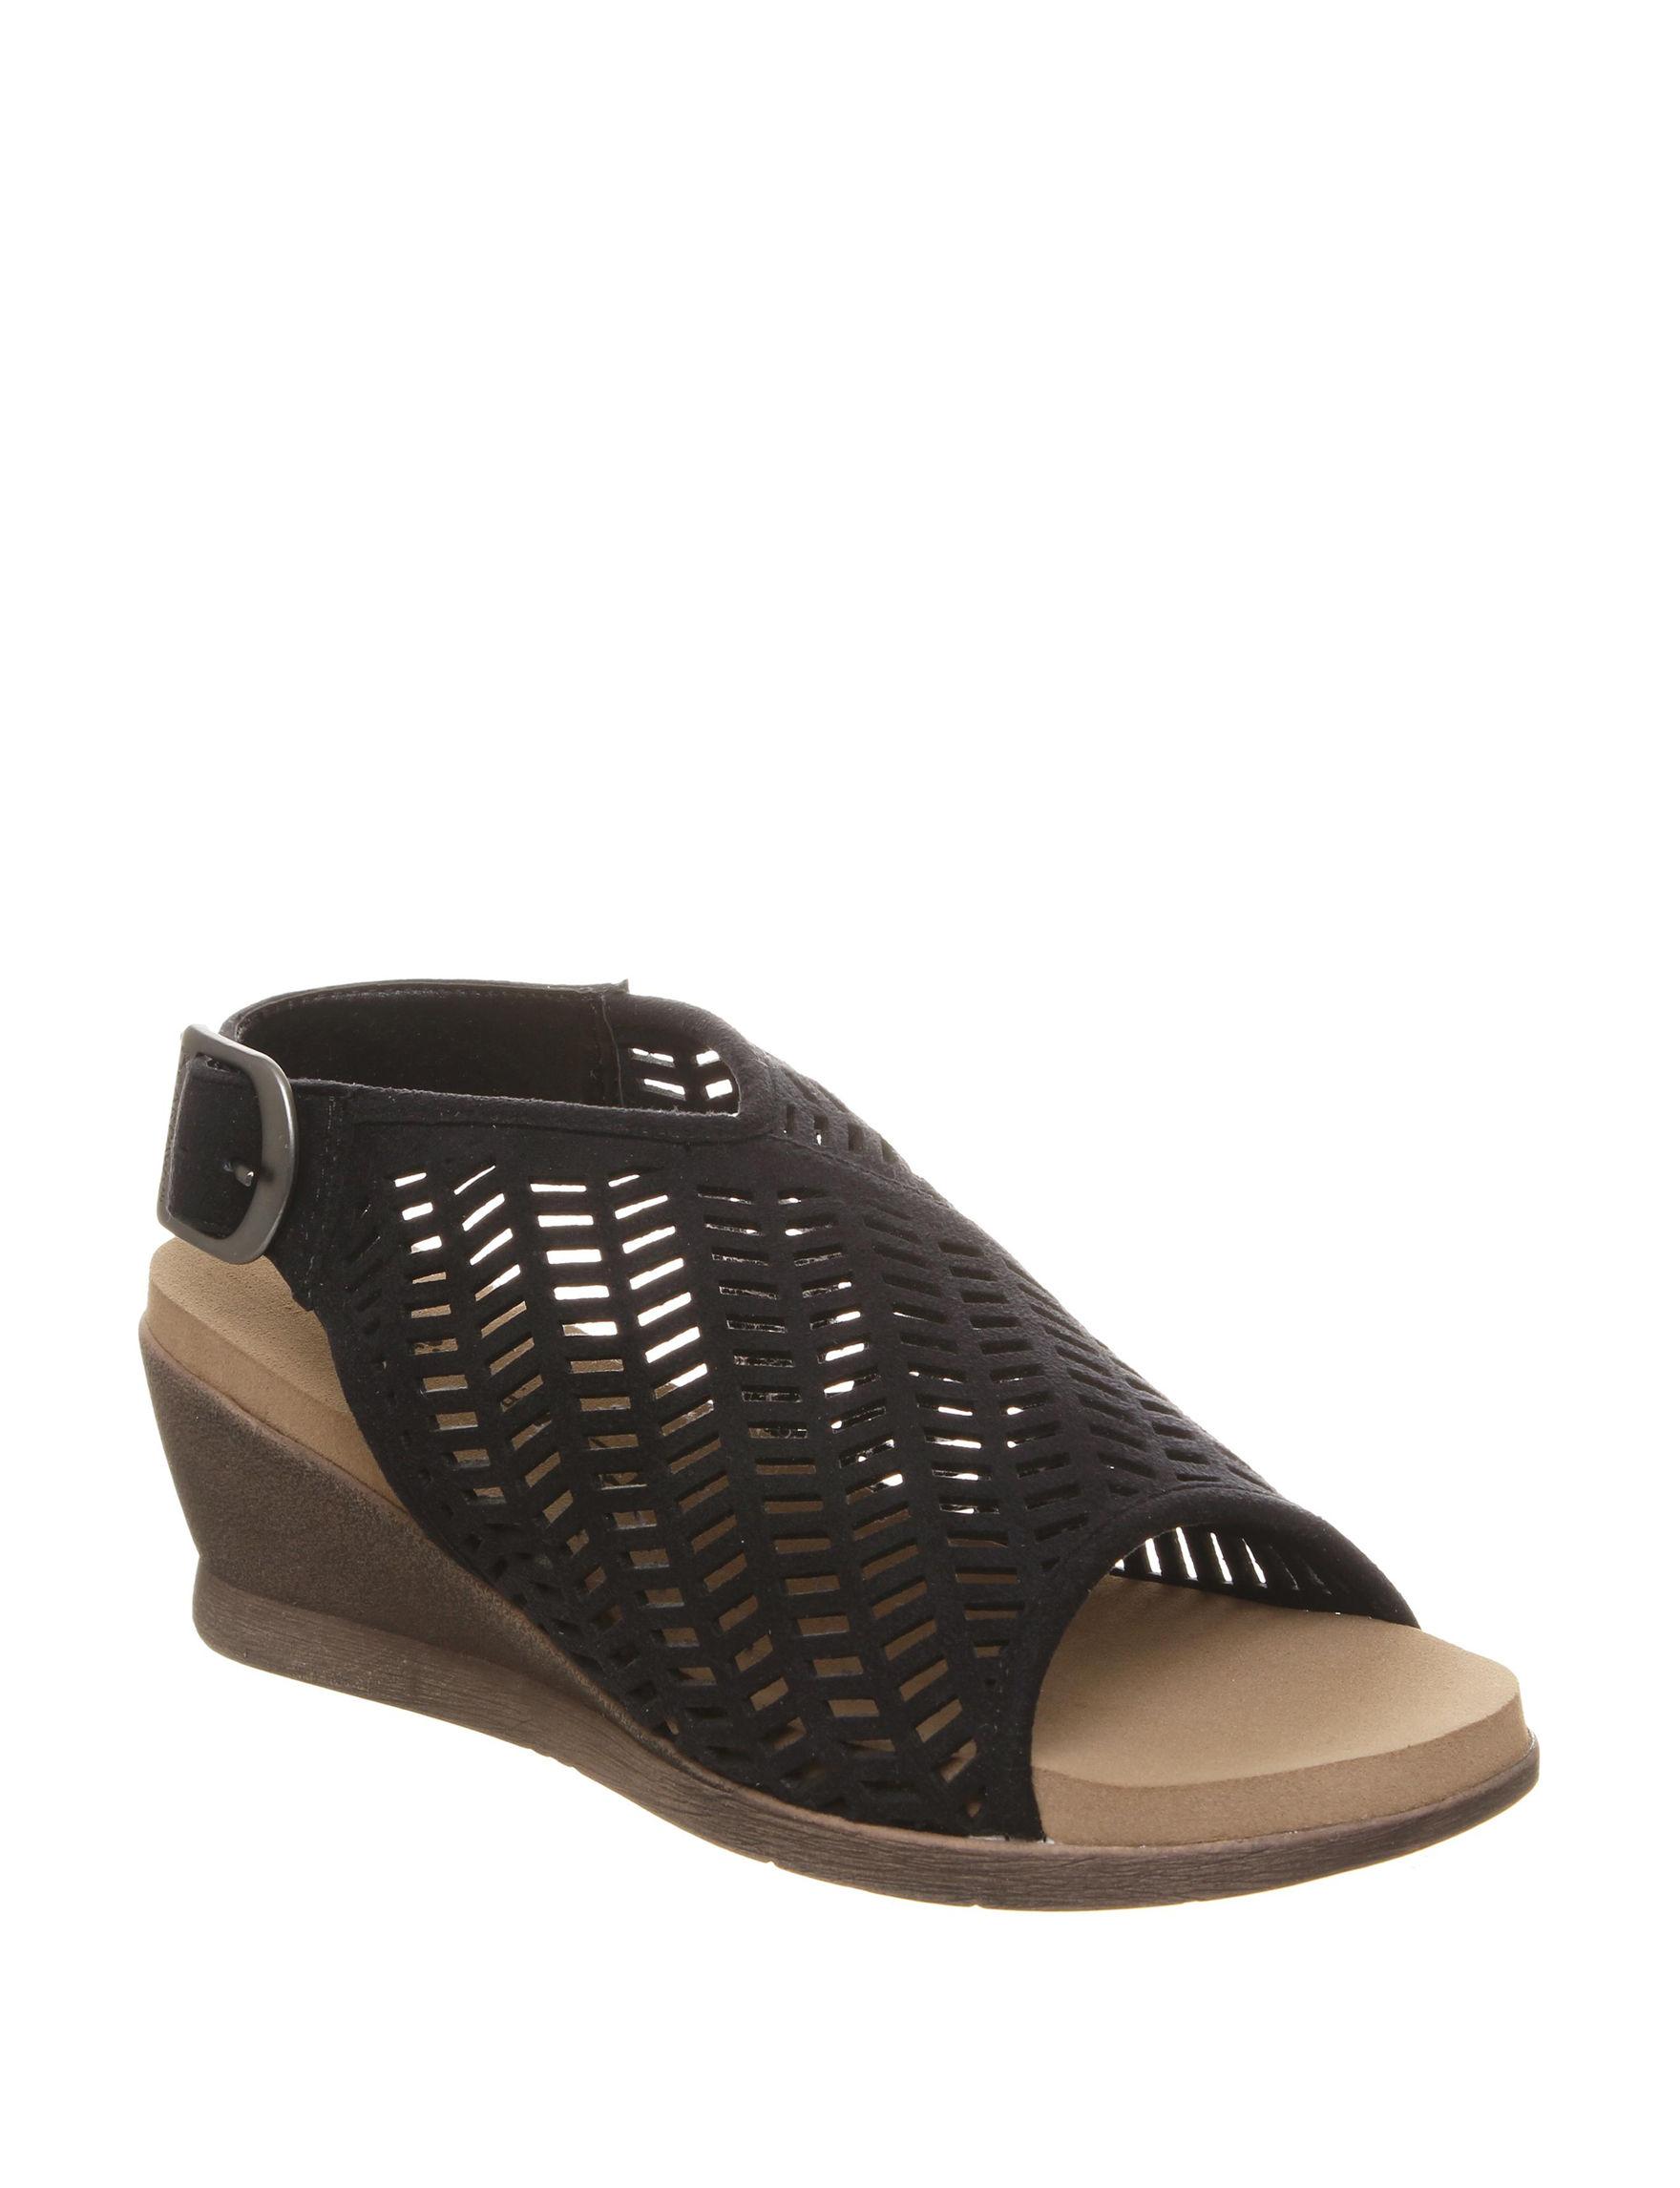 a96df9513f73 Bearpaw Roxie Wedge Sandals